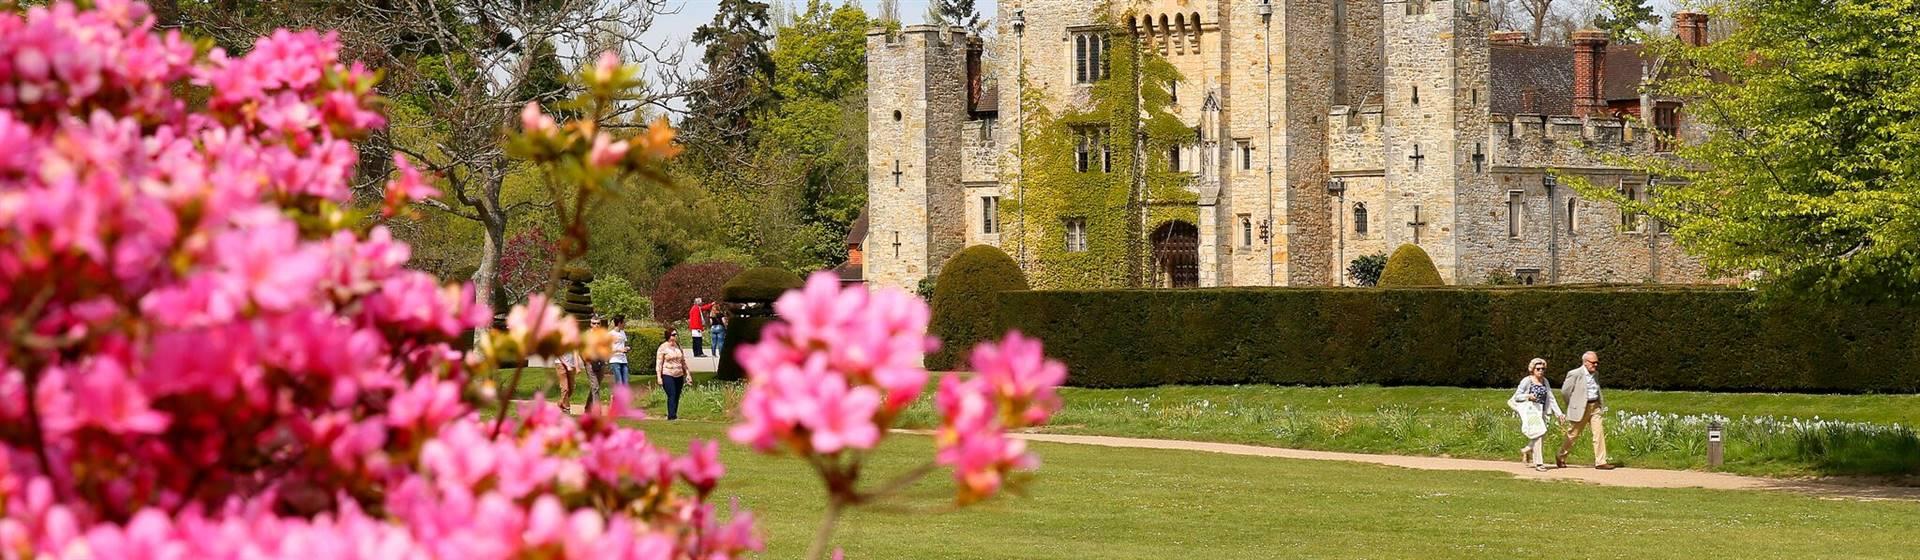 Eastbourne & Hever Castle